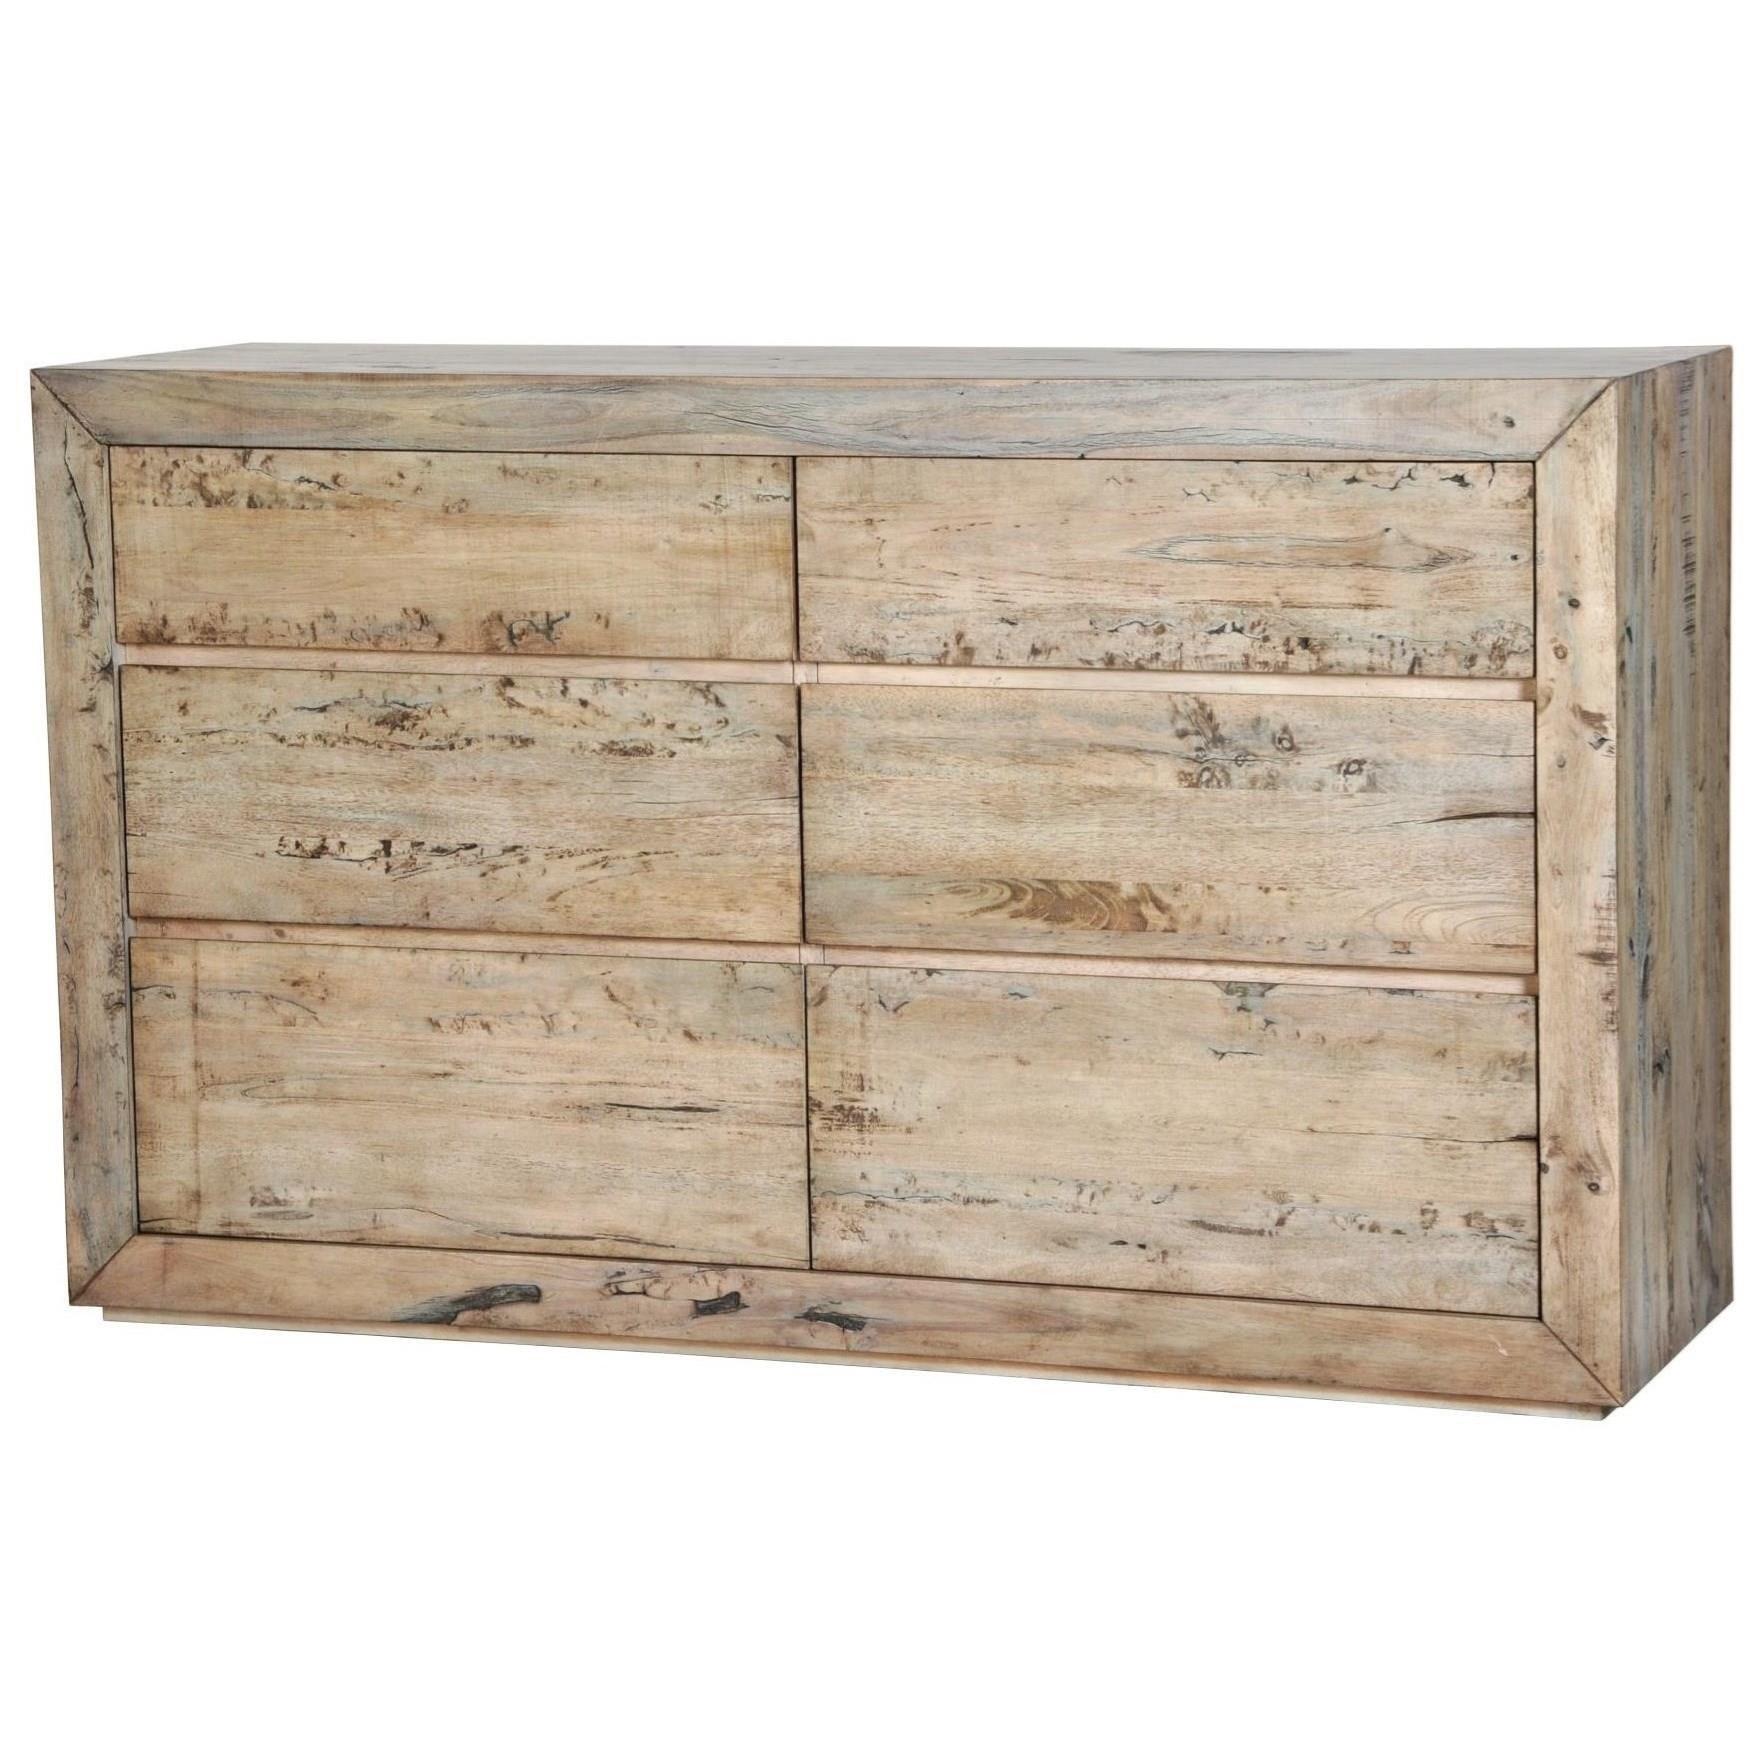 Renewal 6 Drawer Dresser by Napa Furniture Designs at Red Knot